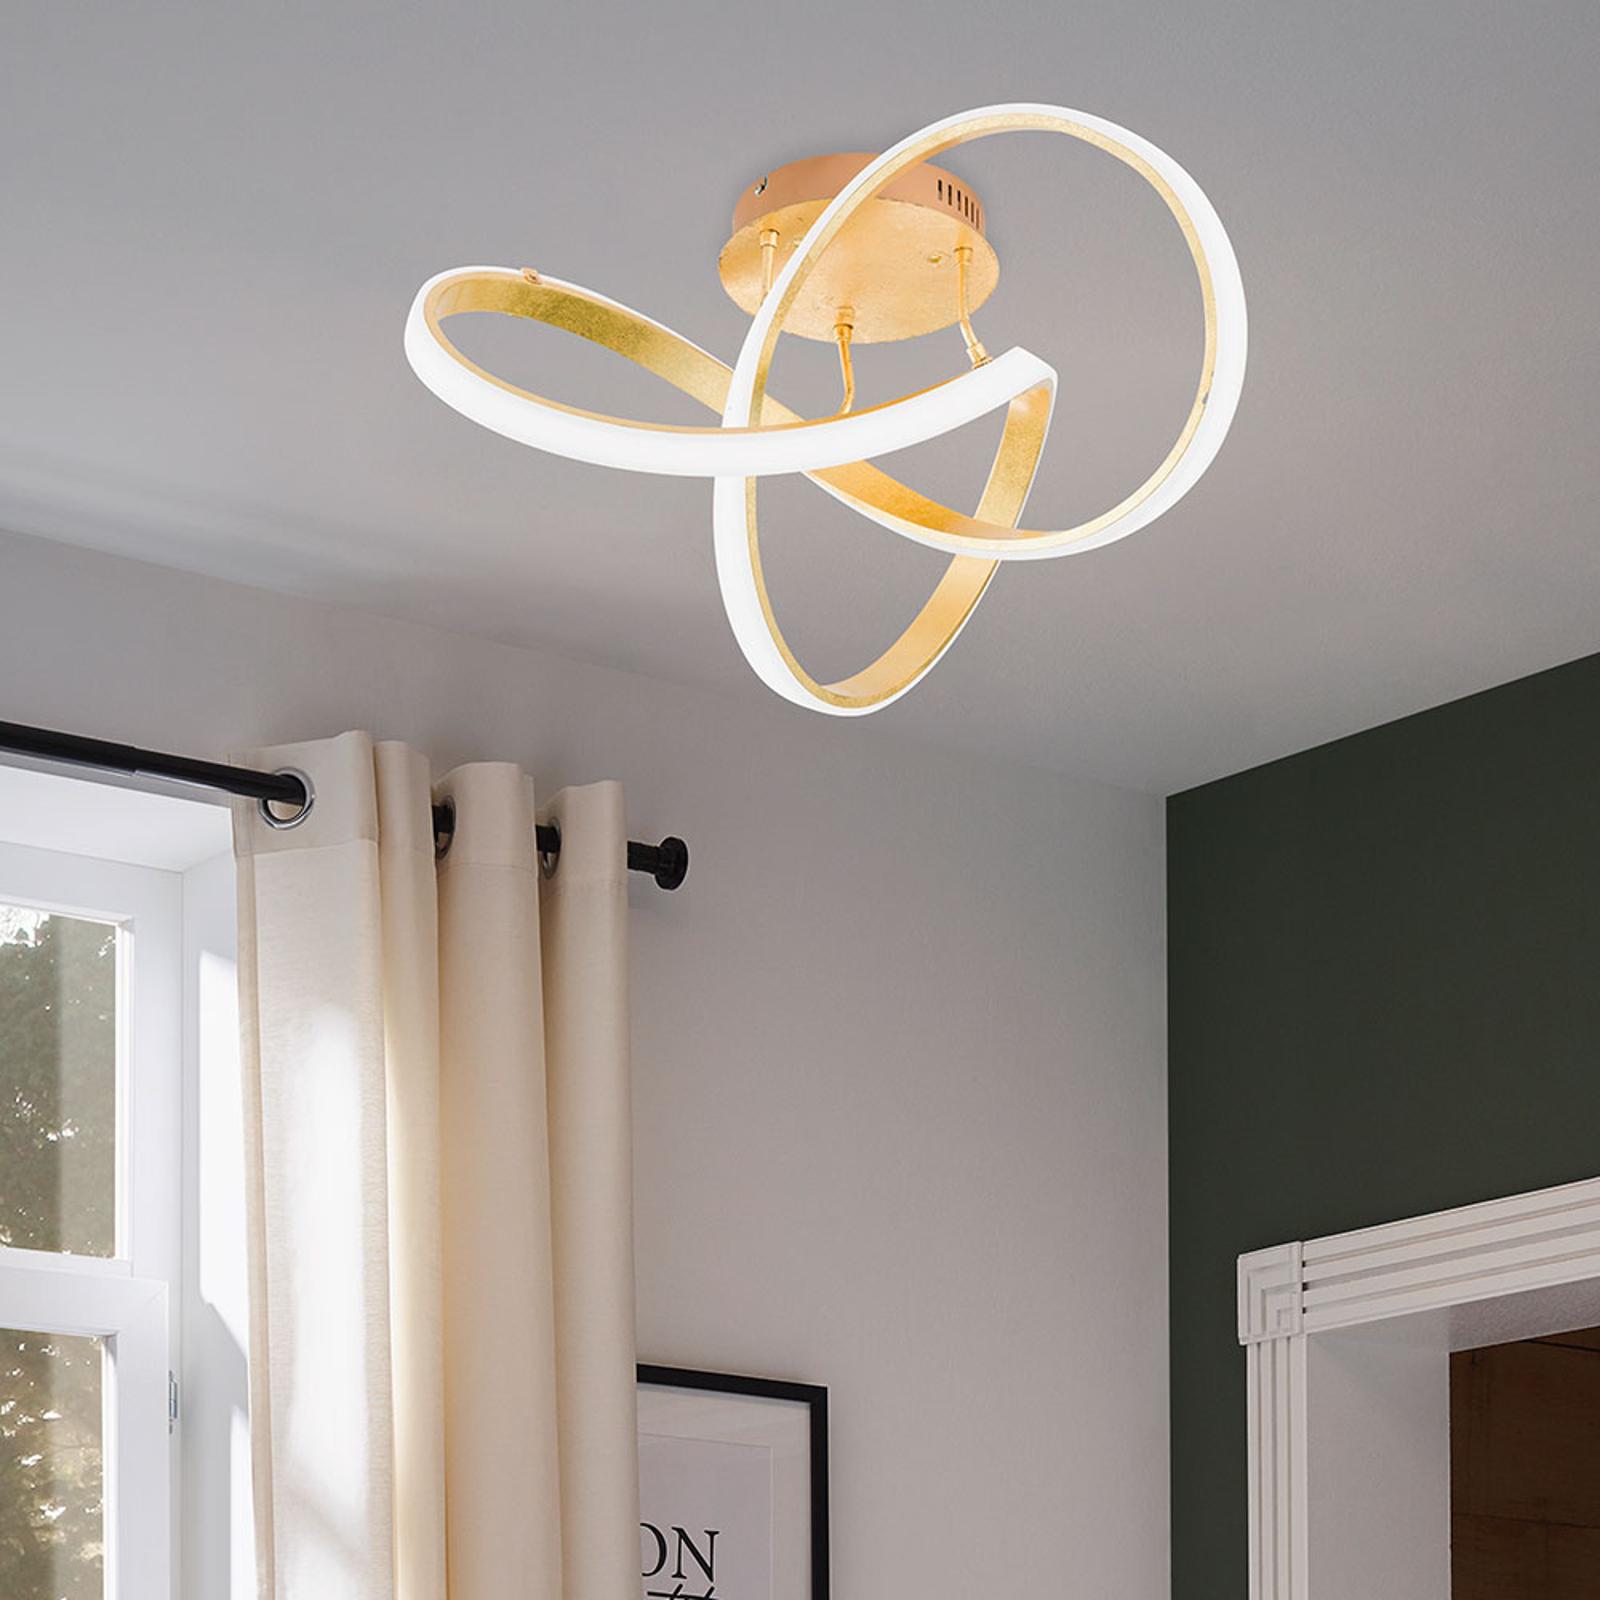 LED-taklampa Indigo, guld